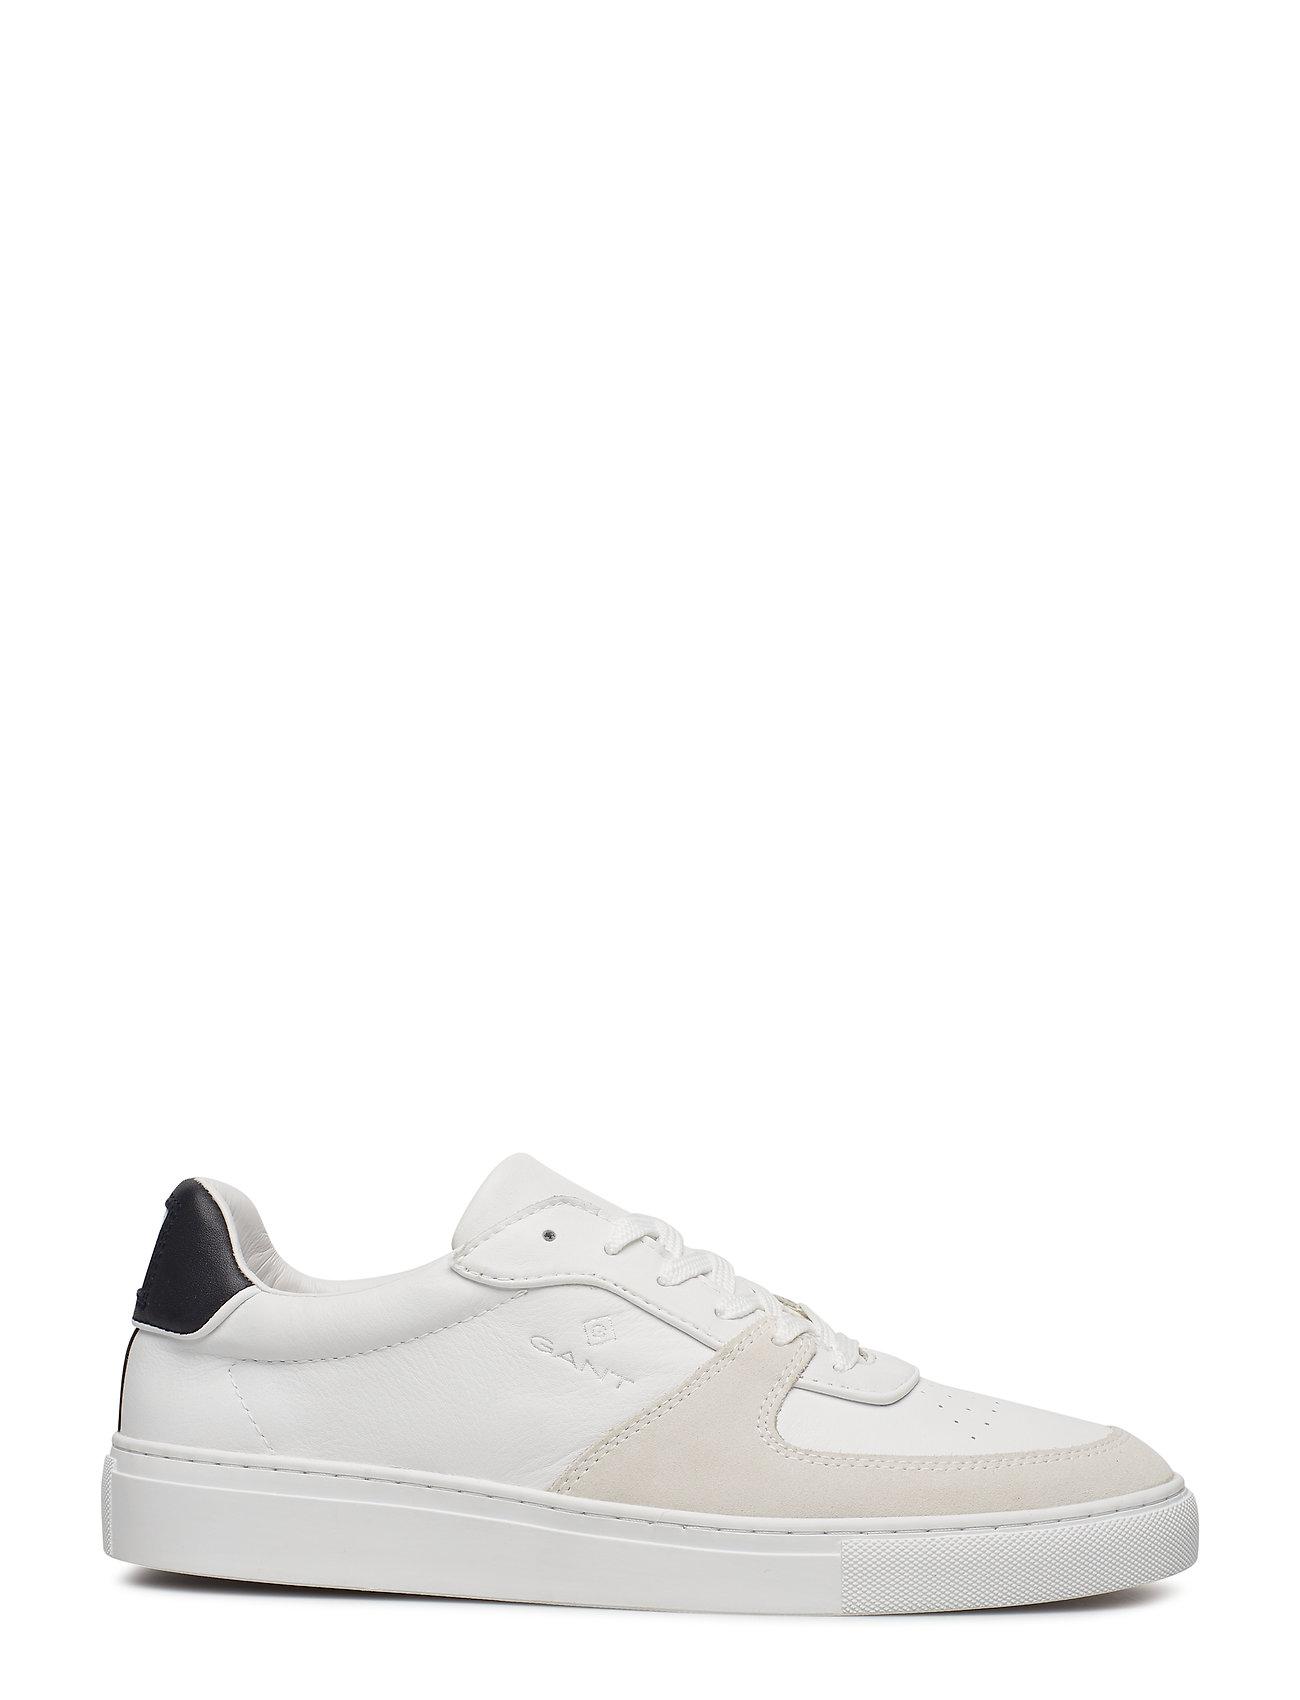 Gant Denver Cupsole Low Niedrige Sneaker Weiß GANT Herren